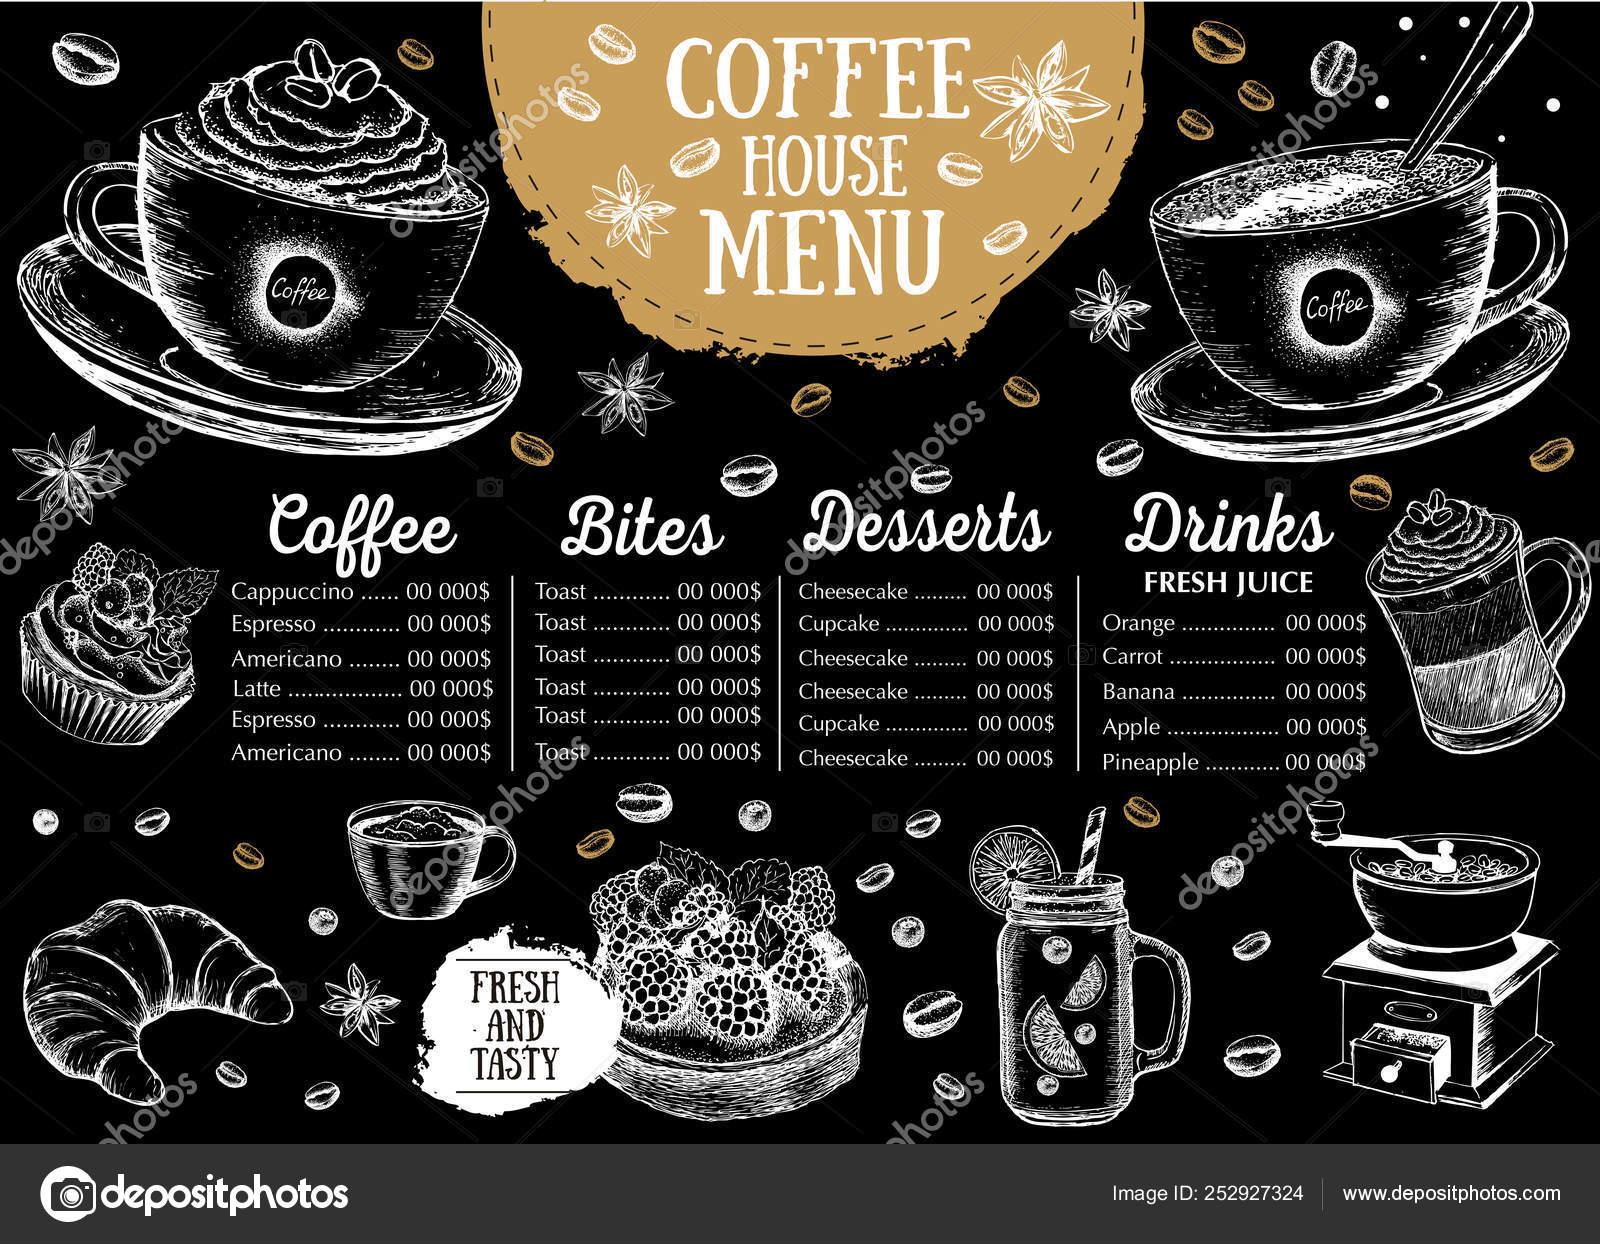 Coffee House Menu Restaurant Cafe Menu Template Design Food Flyer Stock Vector C Oldesign 252927324